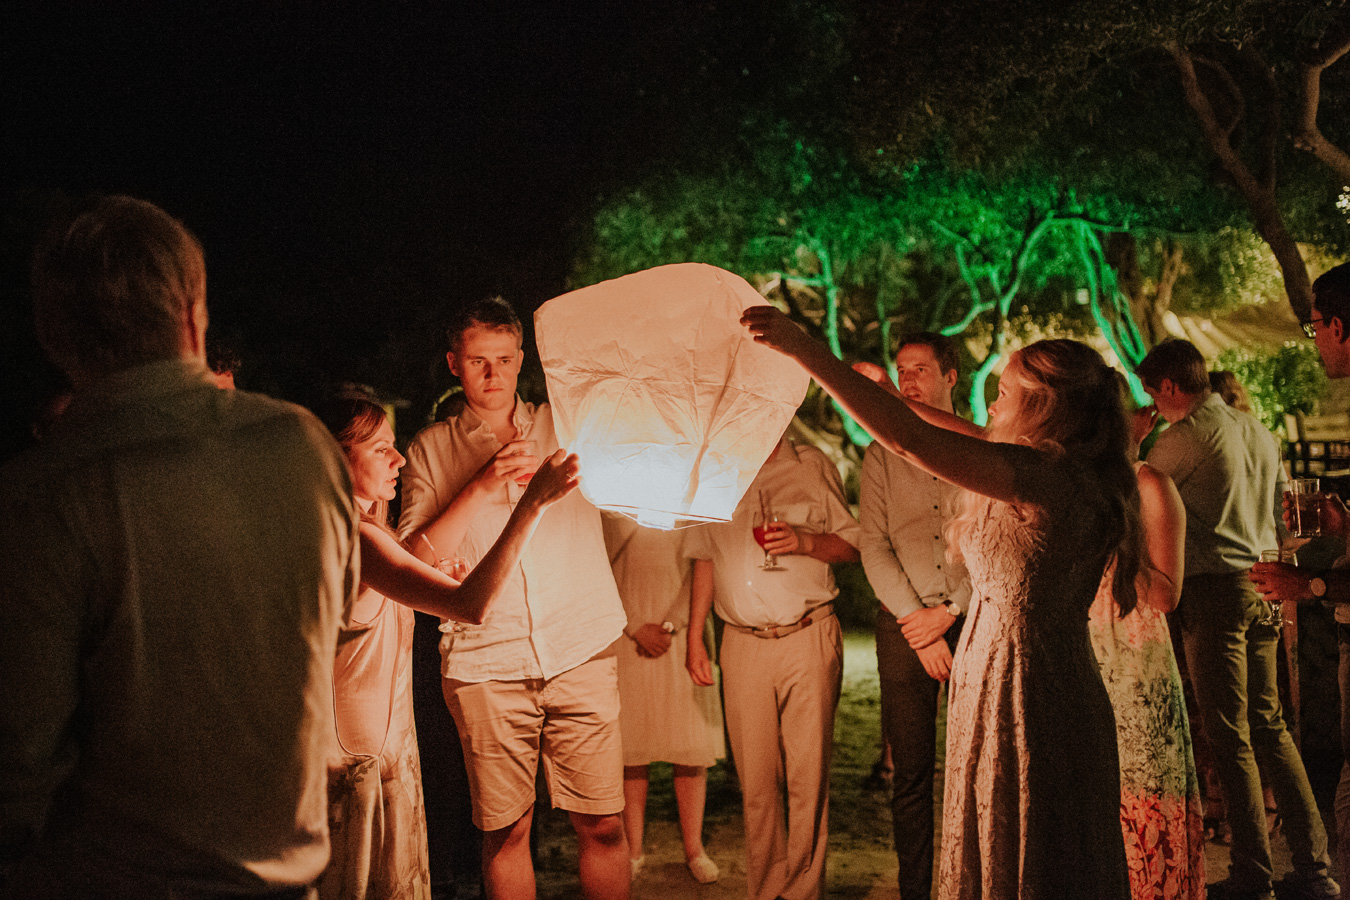 112-bryllupsfotograf-oslo-destinasjonsbryllup-fotograf-tone-tvedt.jpg